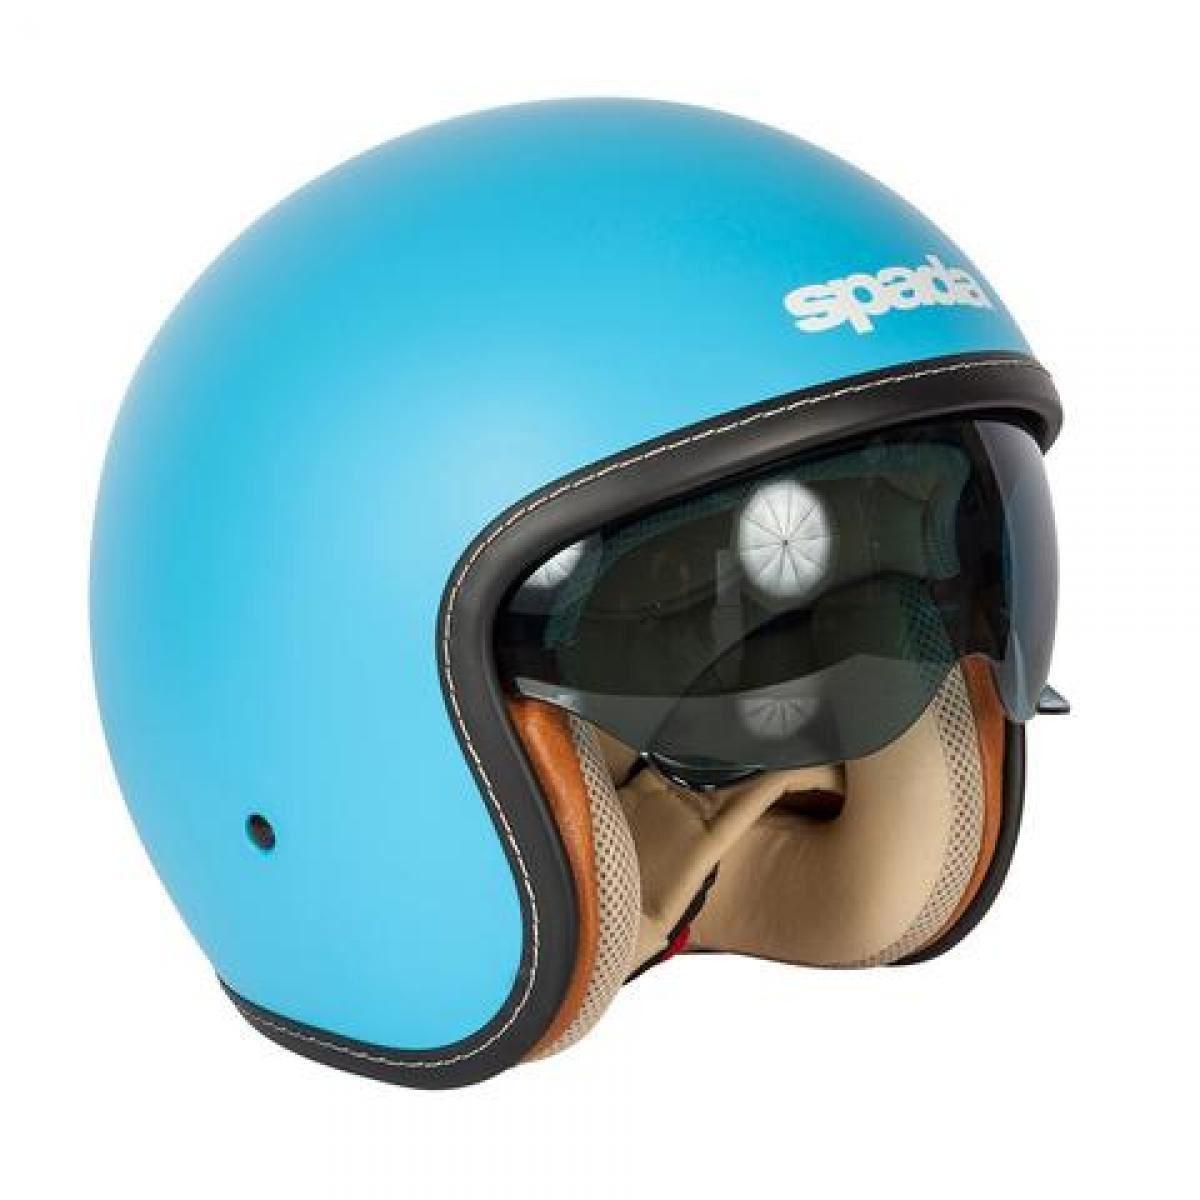 Spada-Raze-Ouvert-Casque-Bleu-Integre-Visiere miniature 24